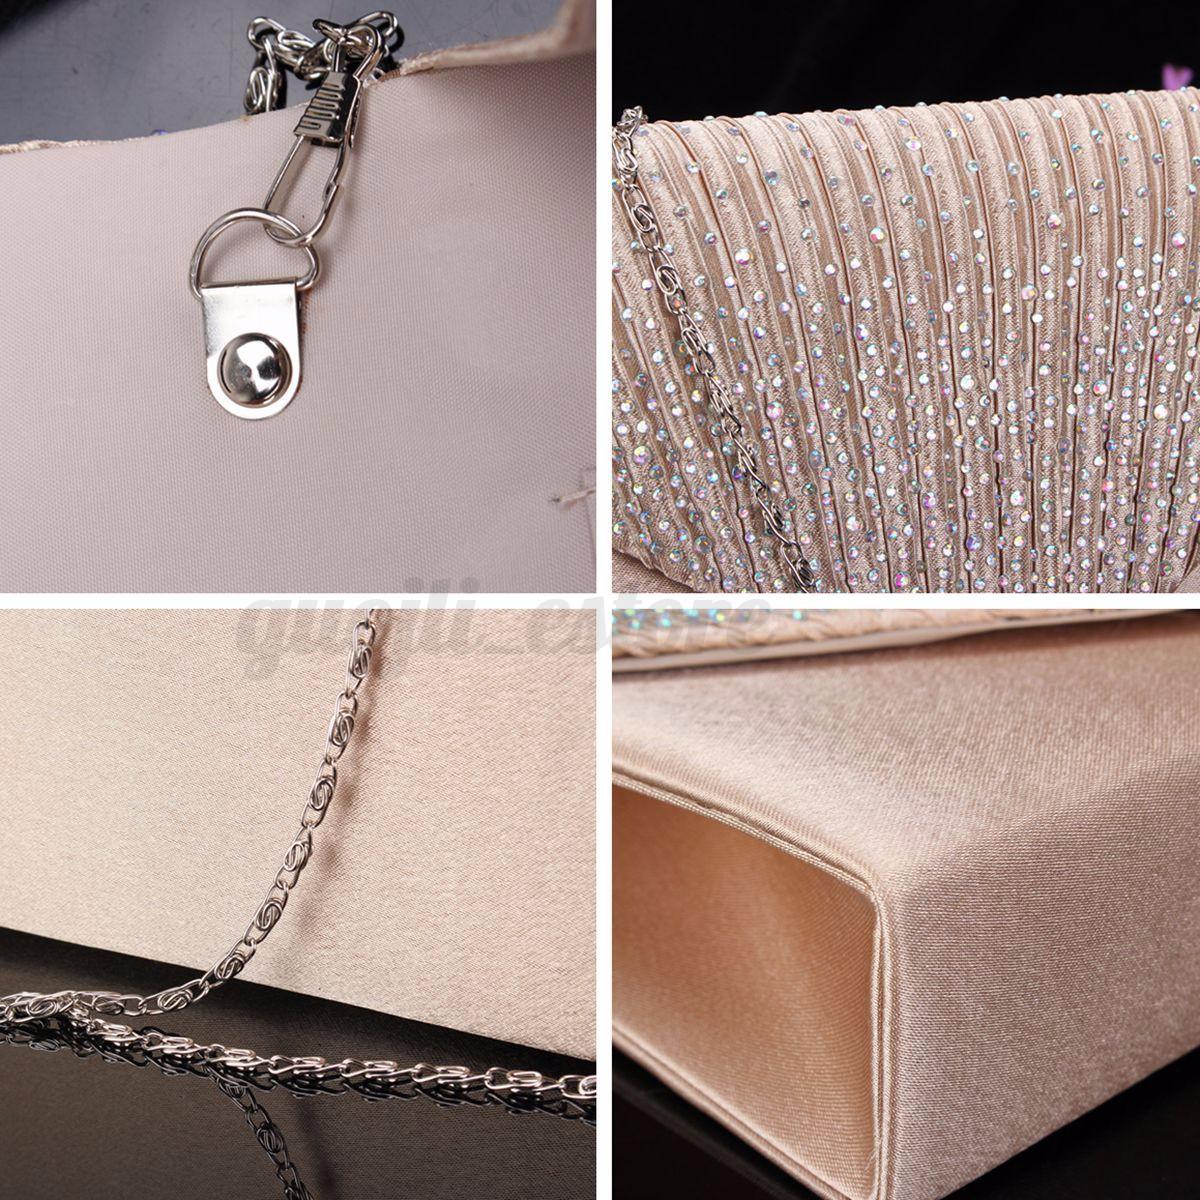 US-Women-Evening-Bag-Satin-Bridal-Clutch-Party-Envelope-Bag-Handbag-Small-Purse thumbnail 10